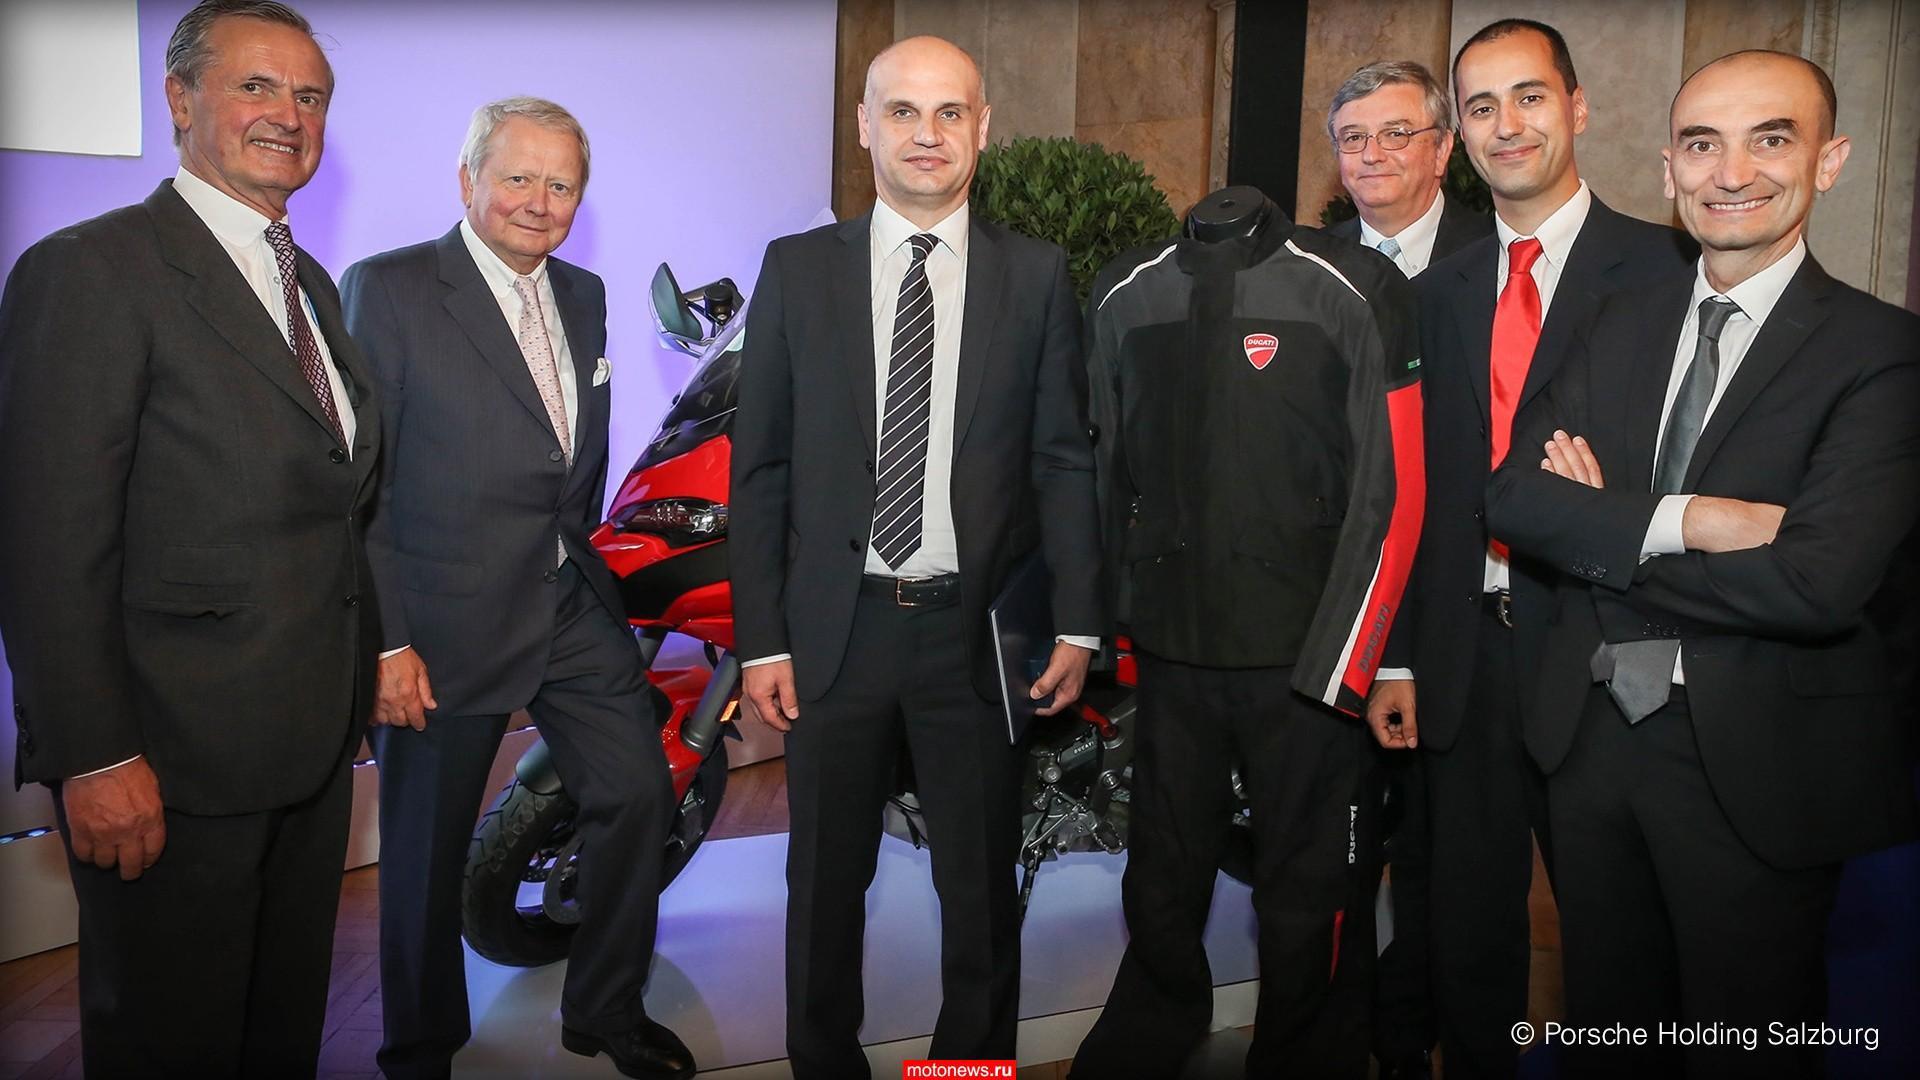 Ducati Multistrada завоевал престижную награду в Австрии